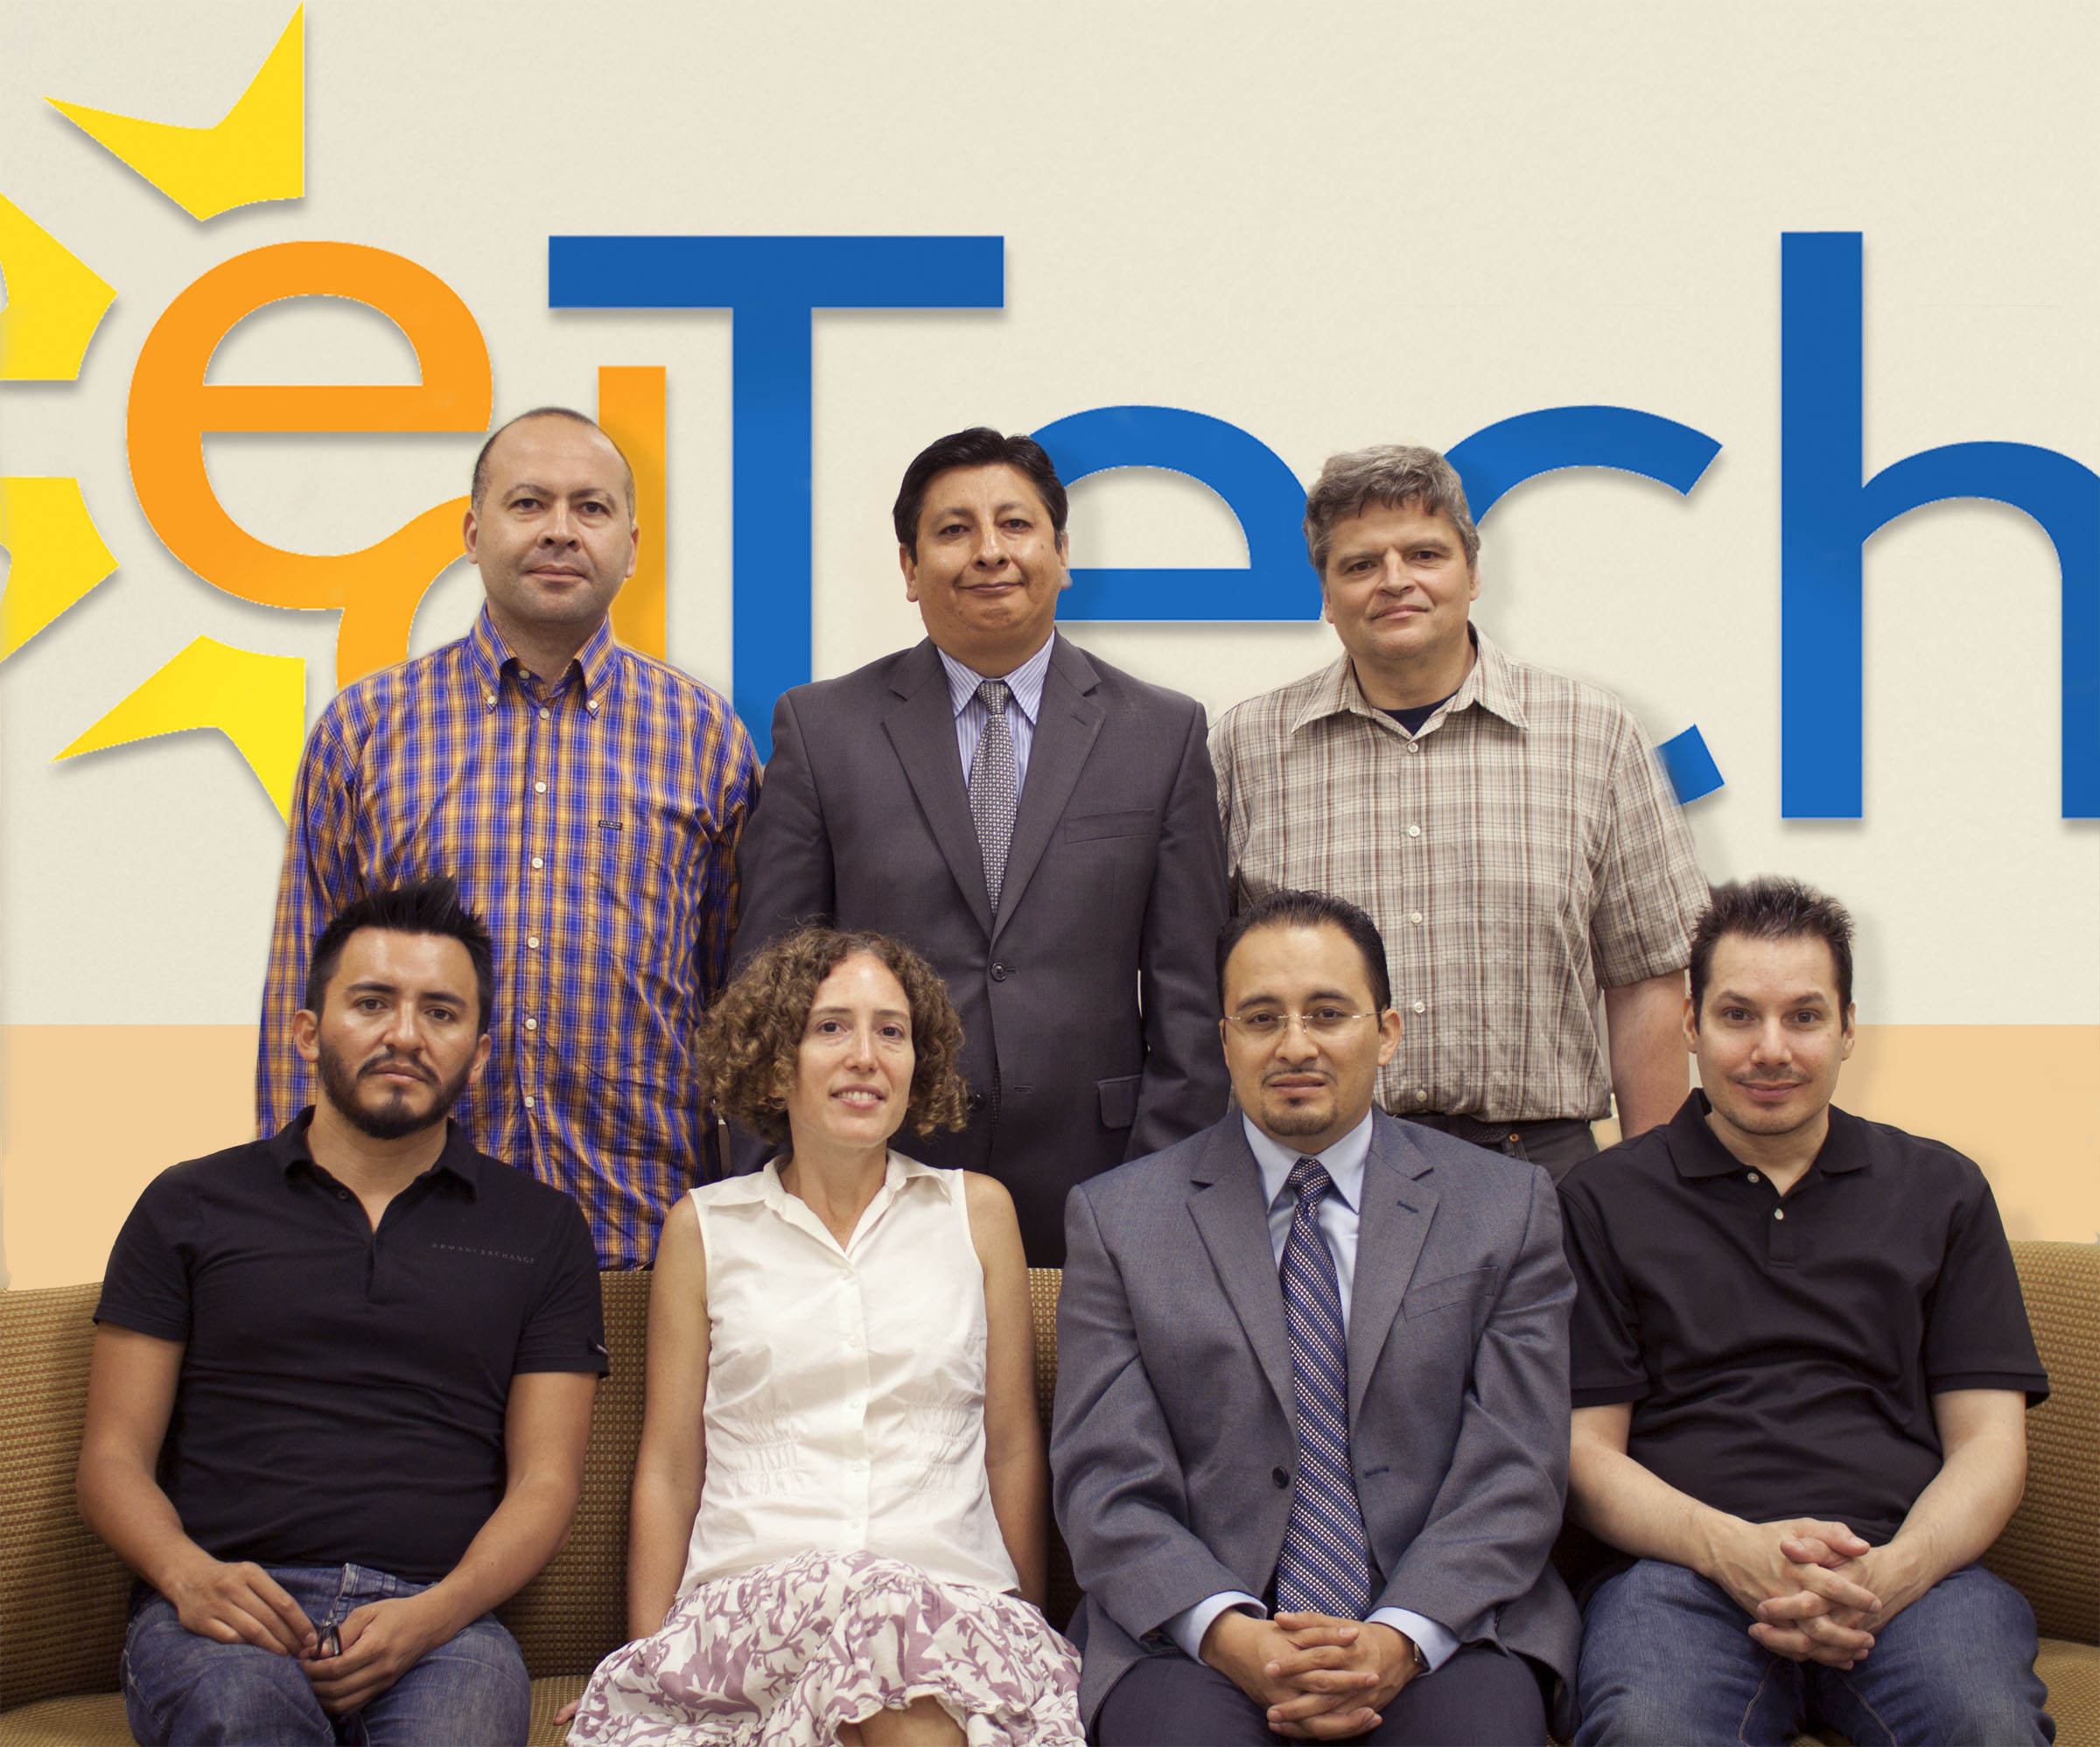 edtech_staff